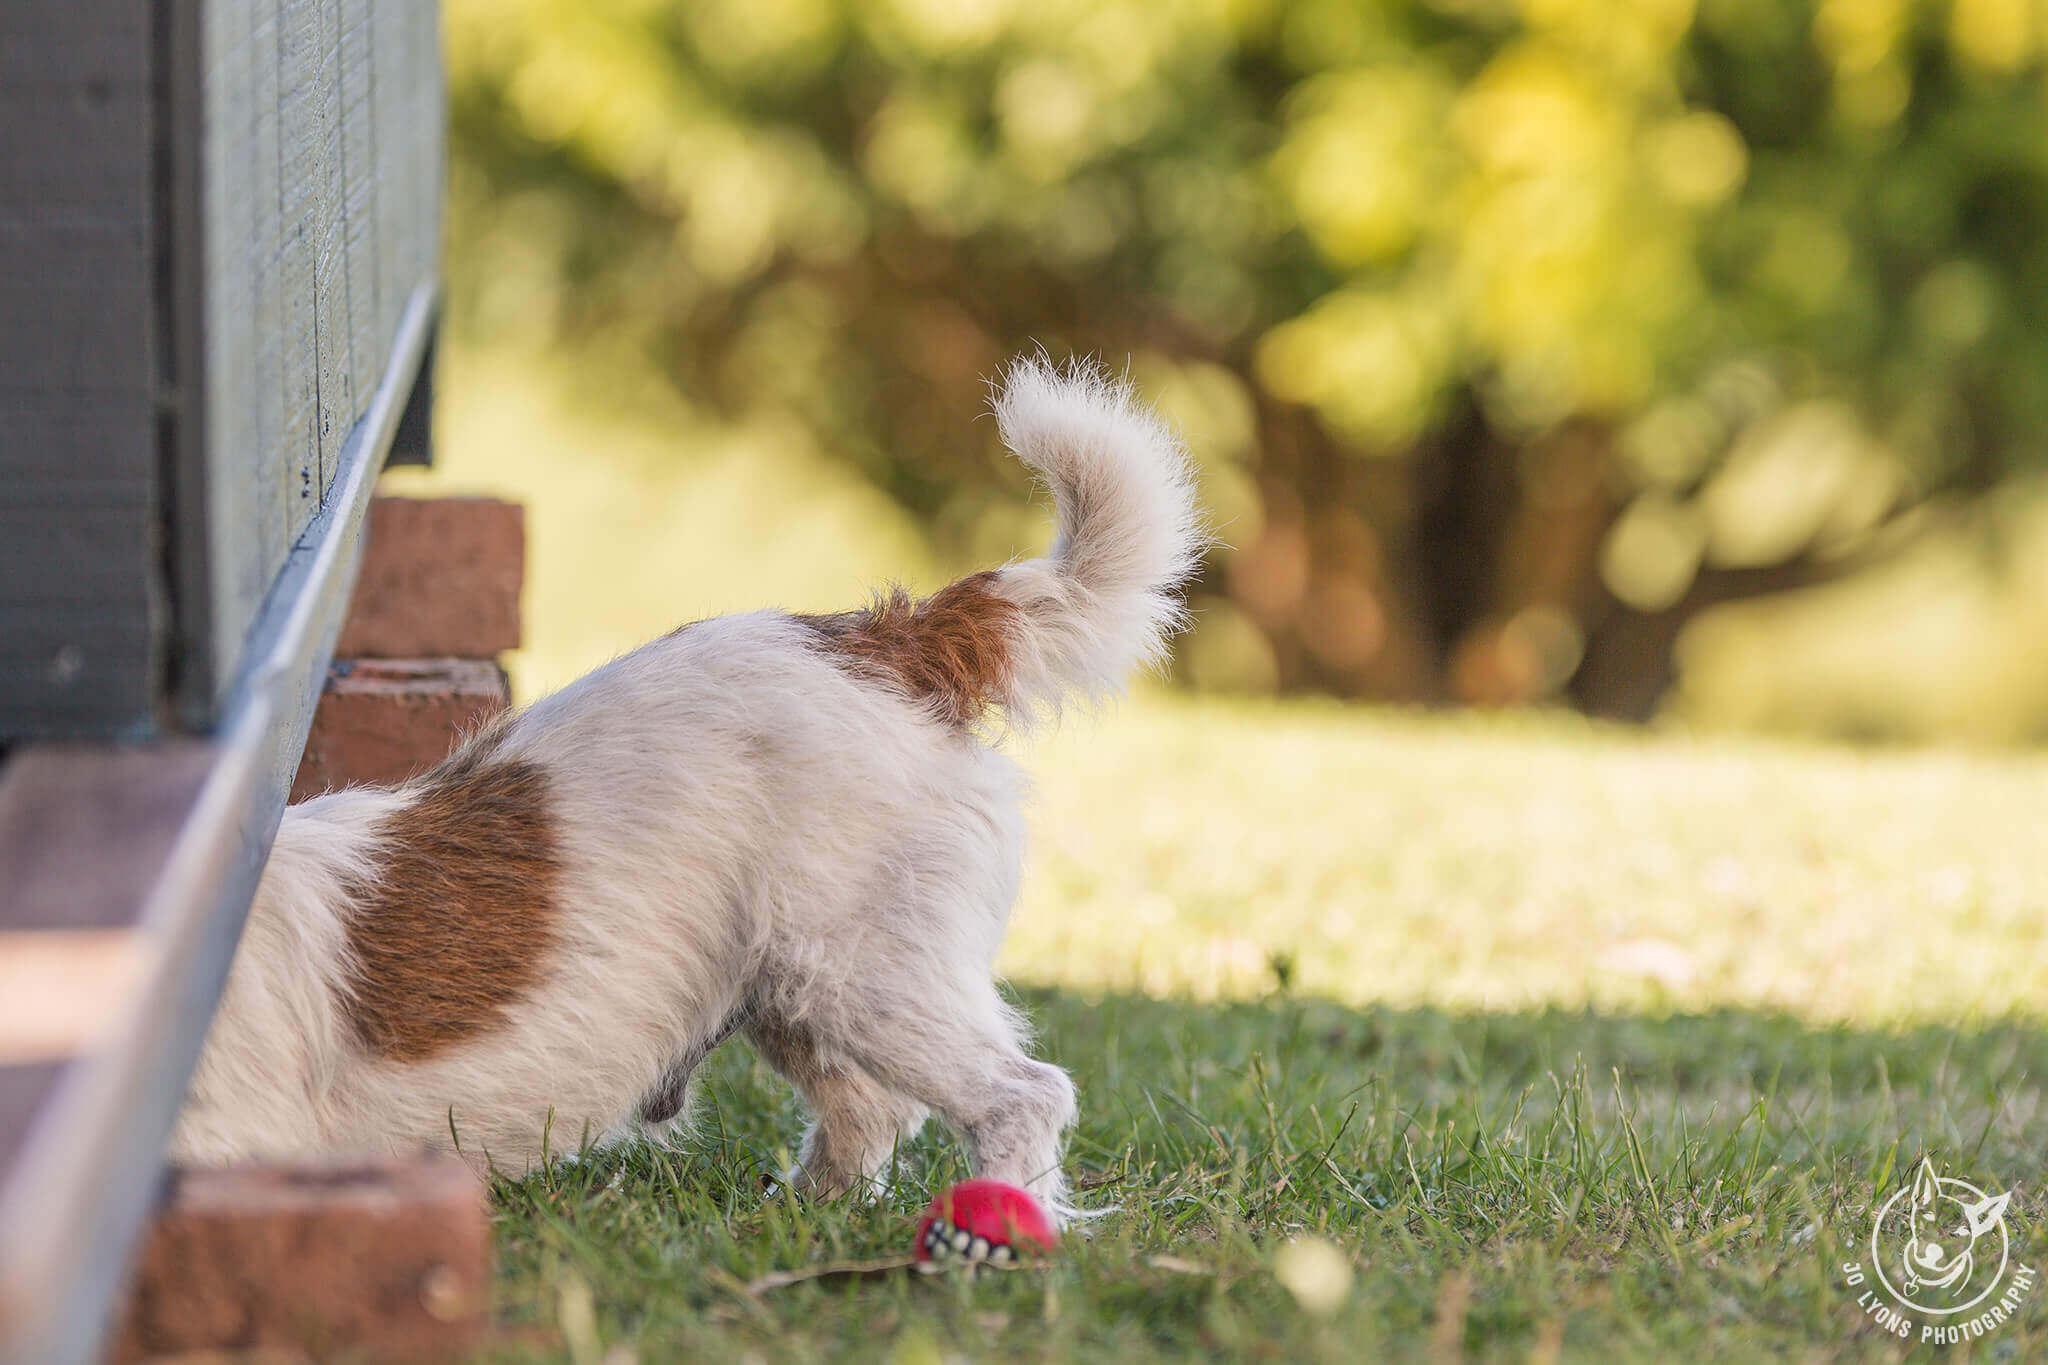 Jack Russell Terrier up to mischief